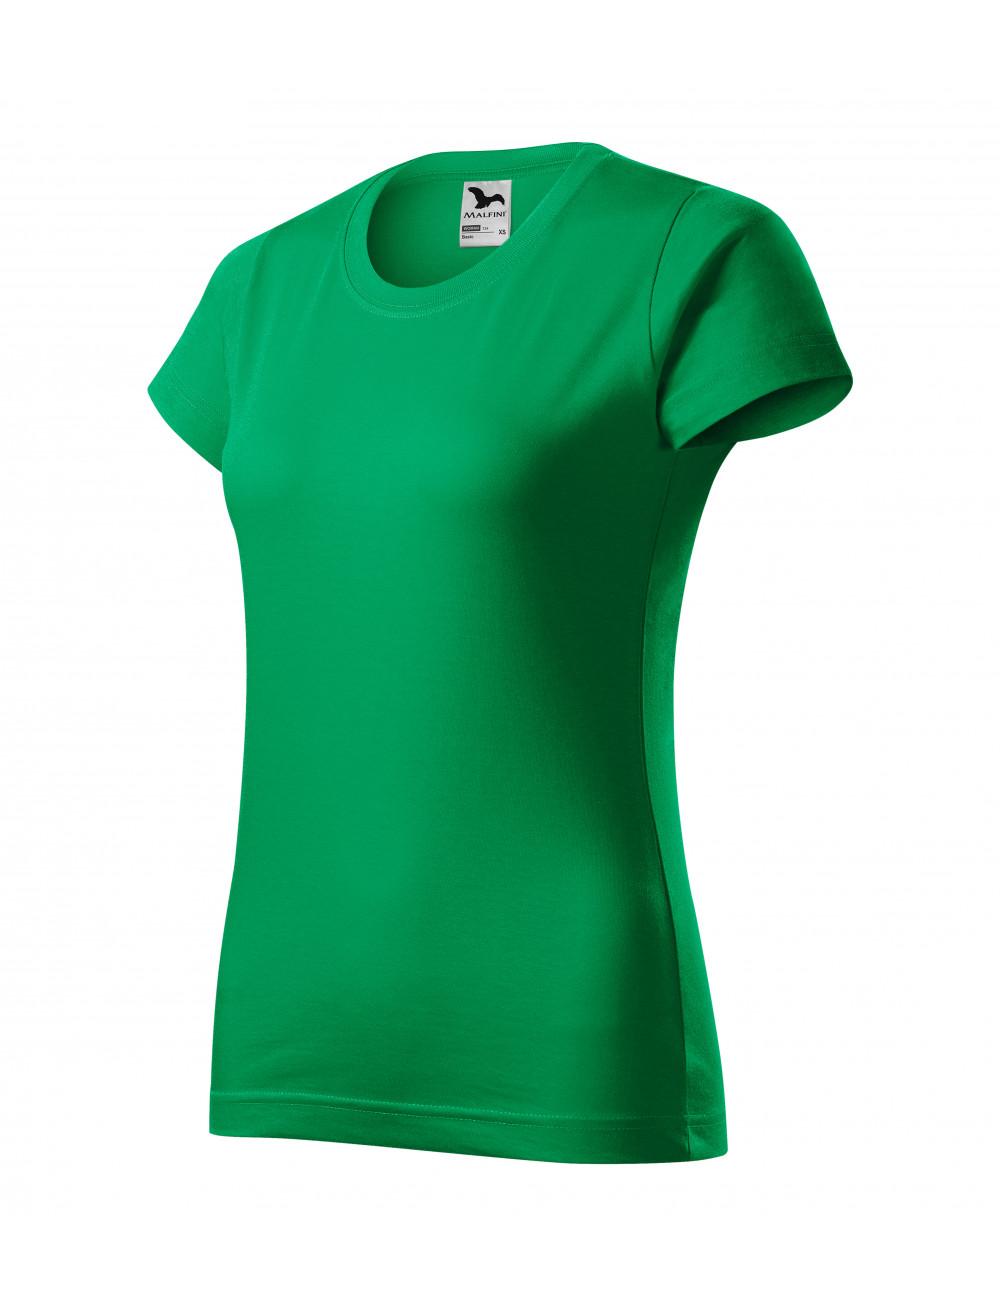 Adler MALFINI Koszulka damska Basic 134 zieleń trawy